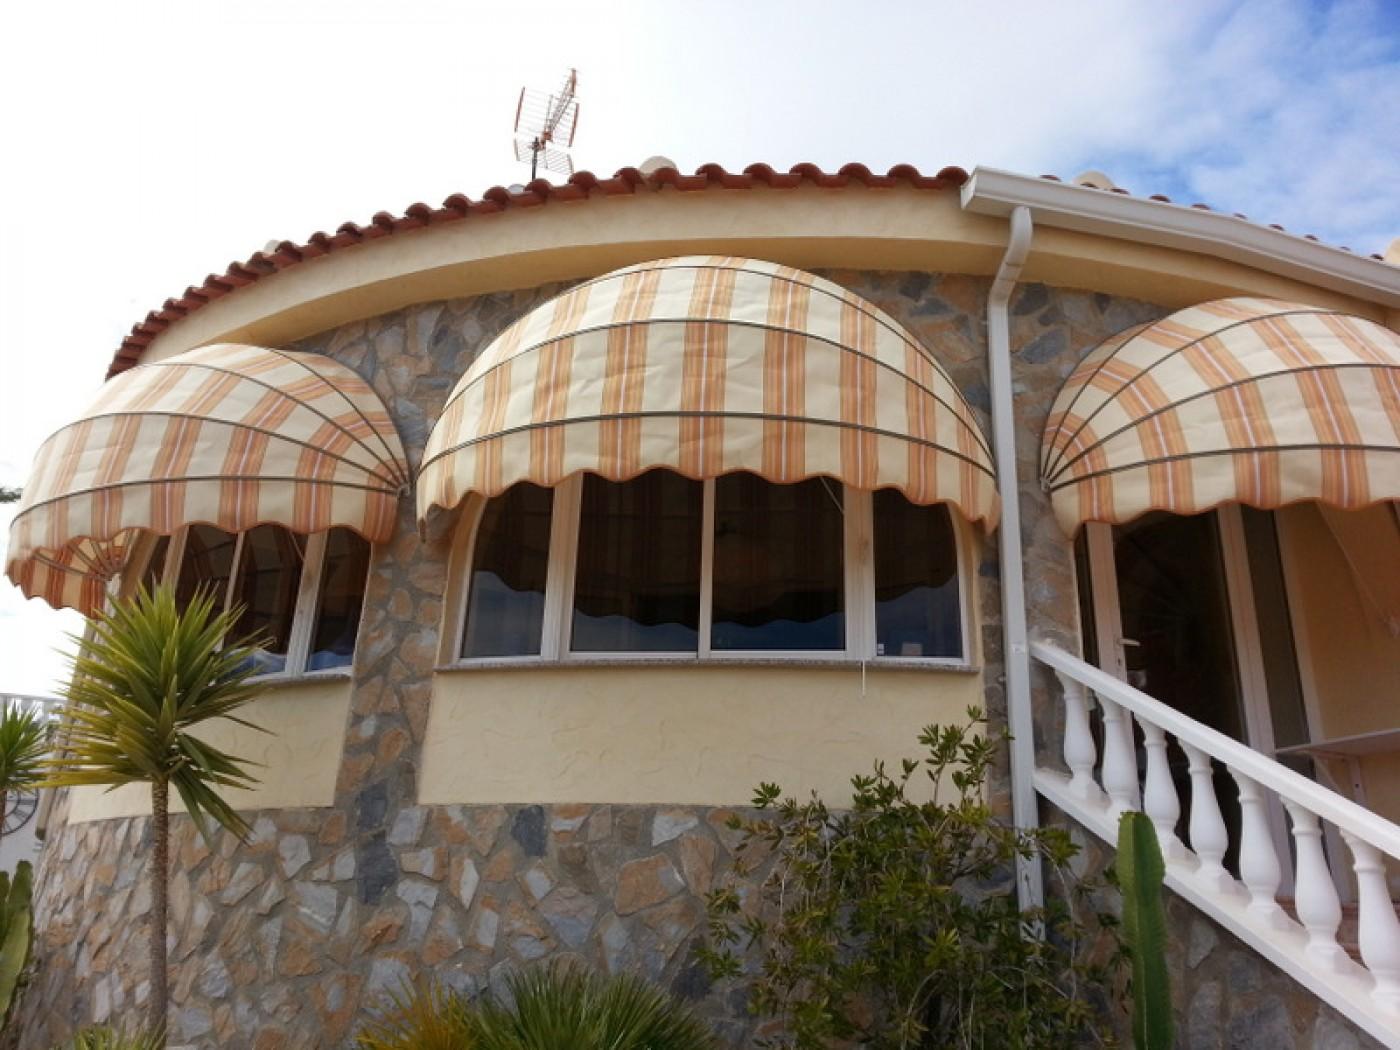 Blinds 4 U; blinds, shutters, awnings, pergola covers Murcia Region